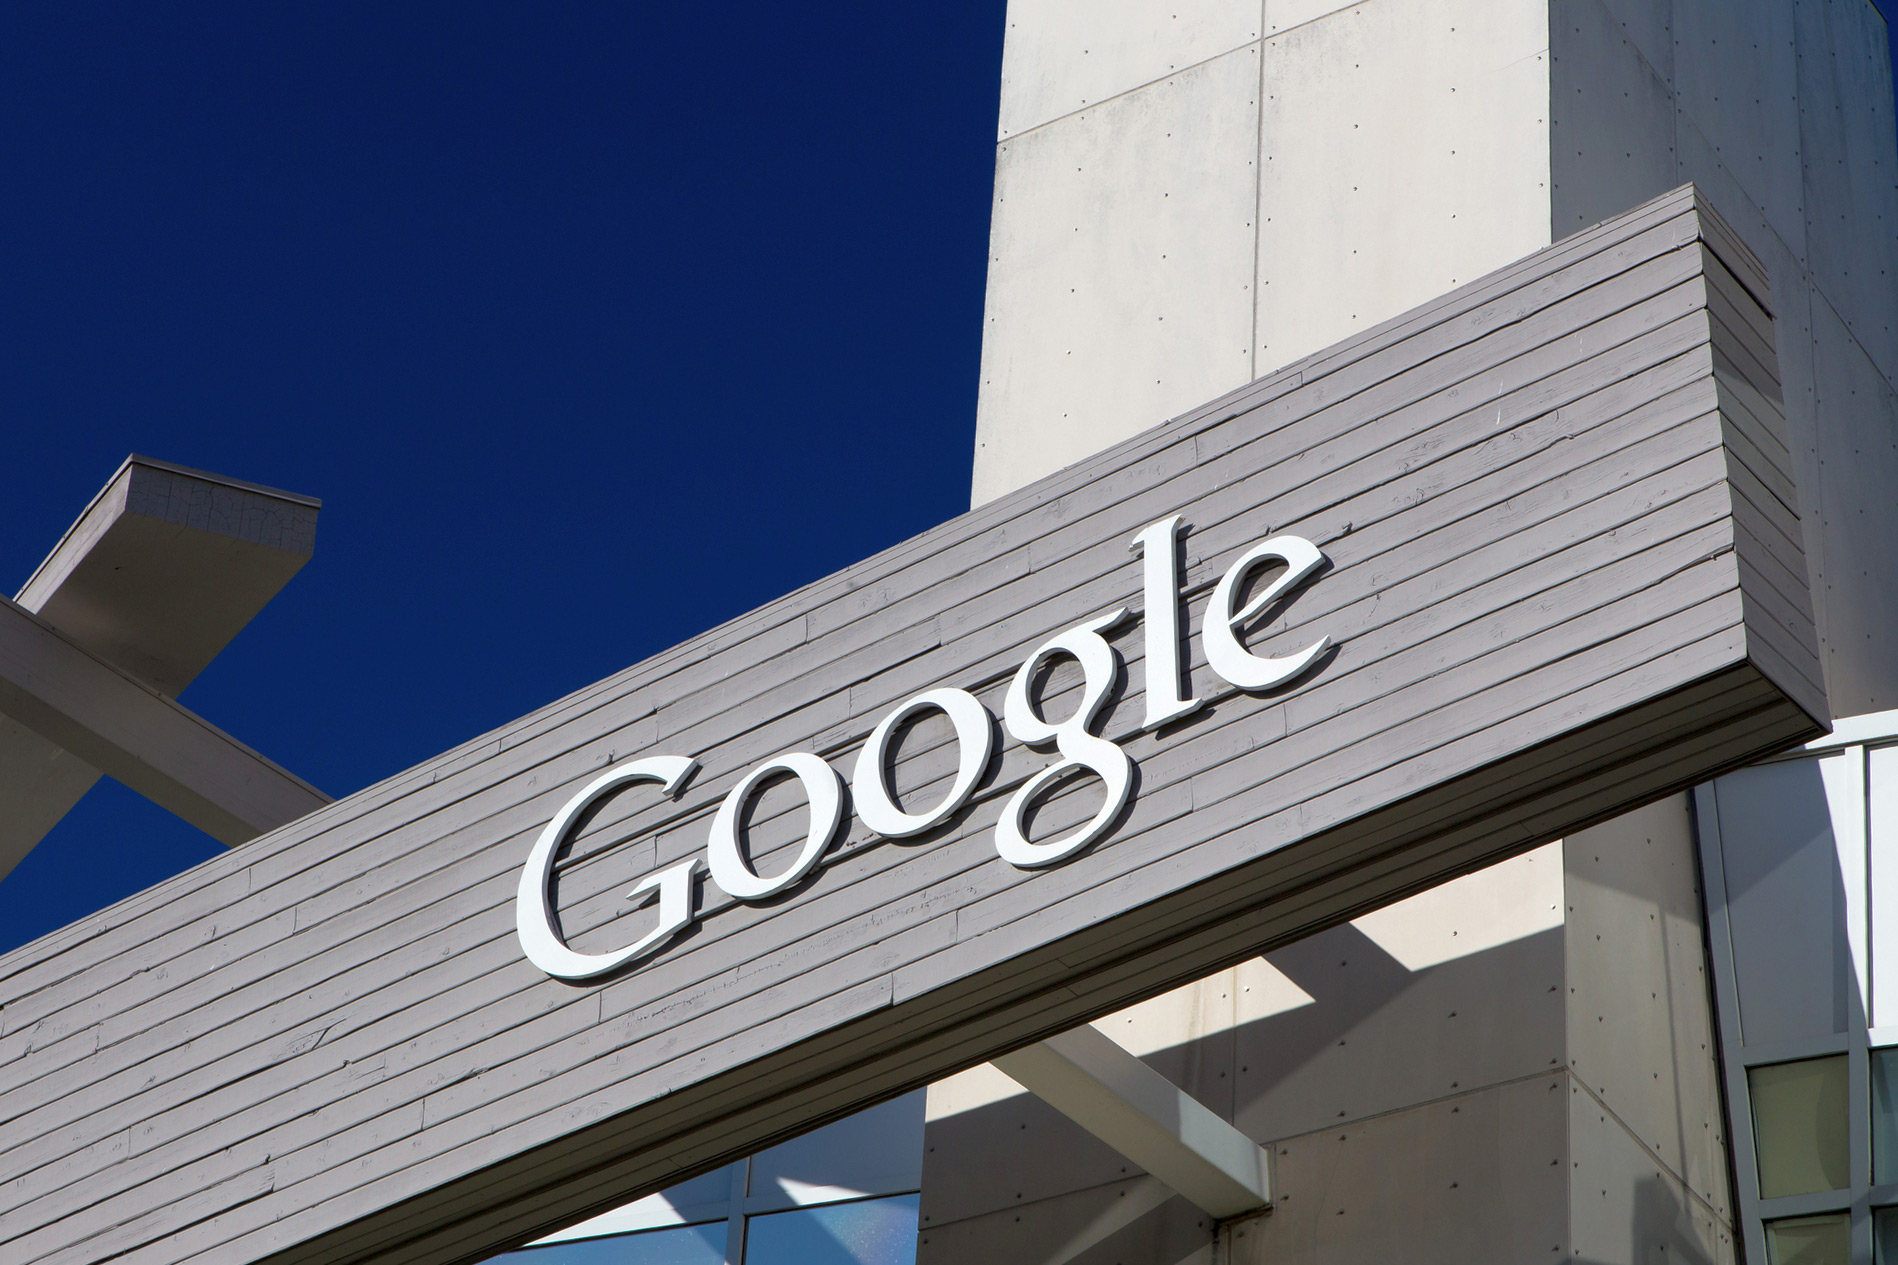 fdlx.com Корпорация Google покупает офис на Манхэттене за рекордные $2,1 миллиарда